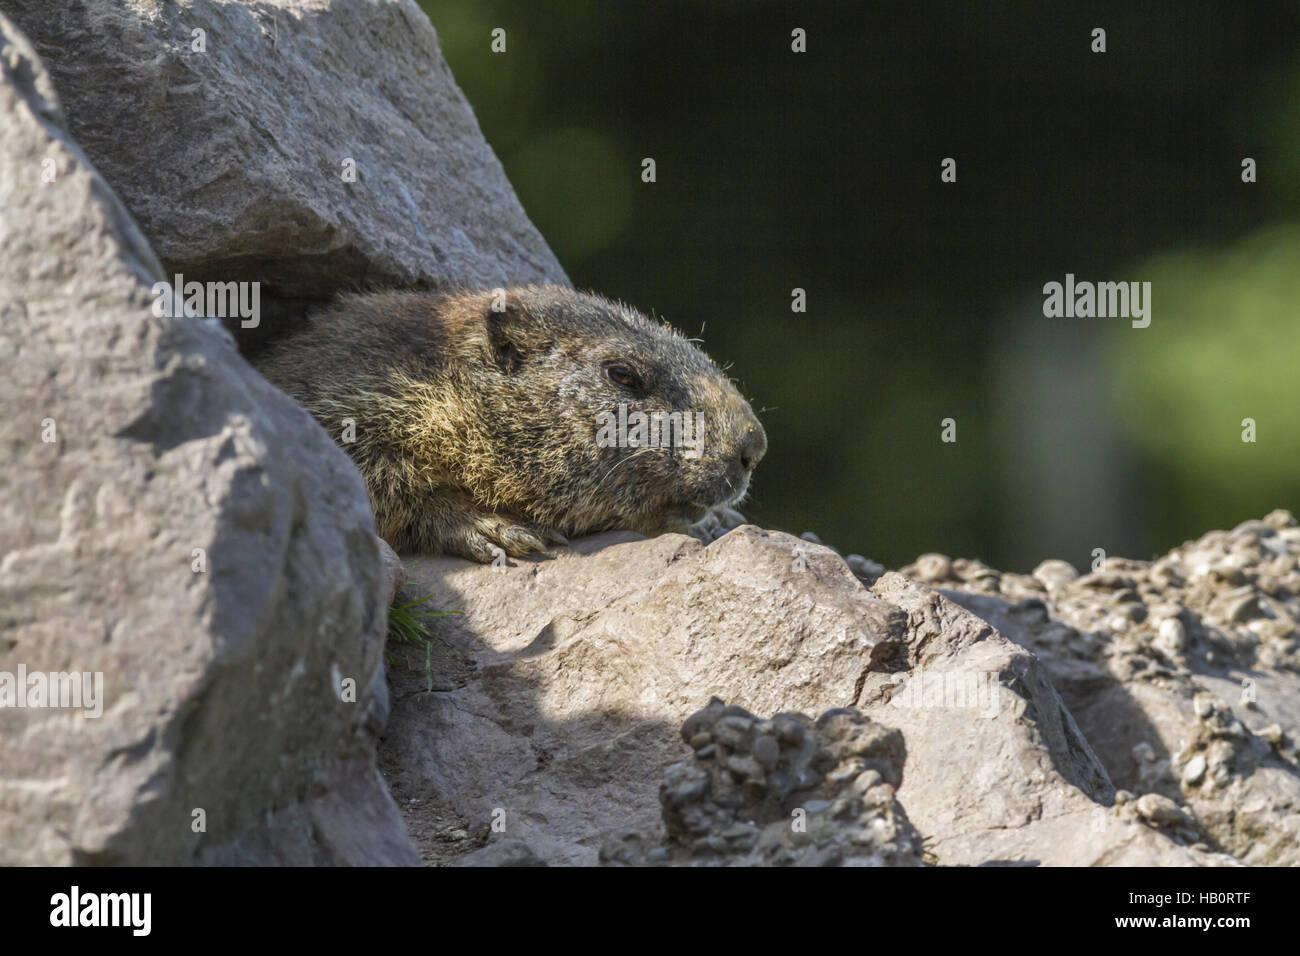 Marmot (Marmota monax) - Stock Image